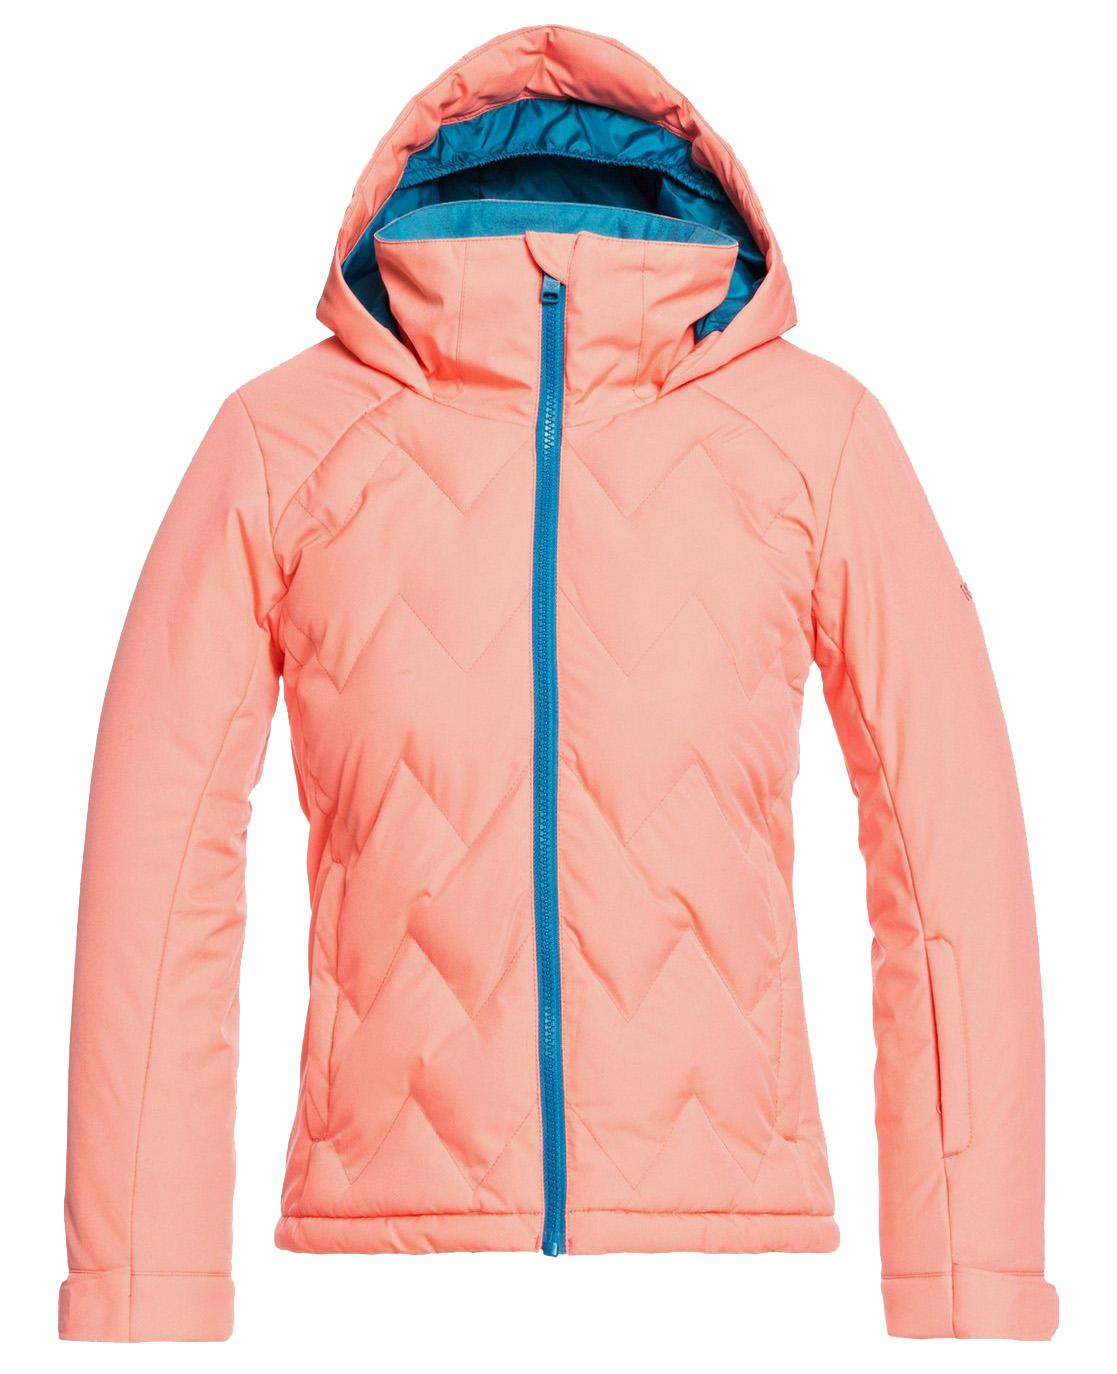 Куртка Сноубордическая Roxy 2020-21 Breeze Fusion Coral (Возраст:12)